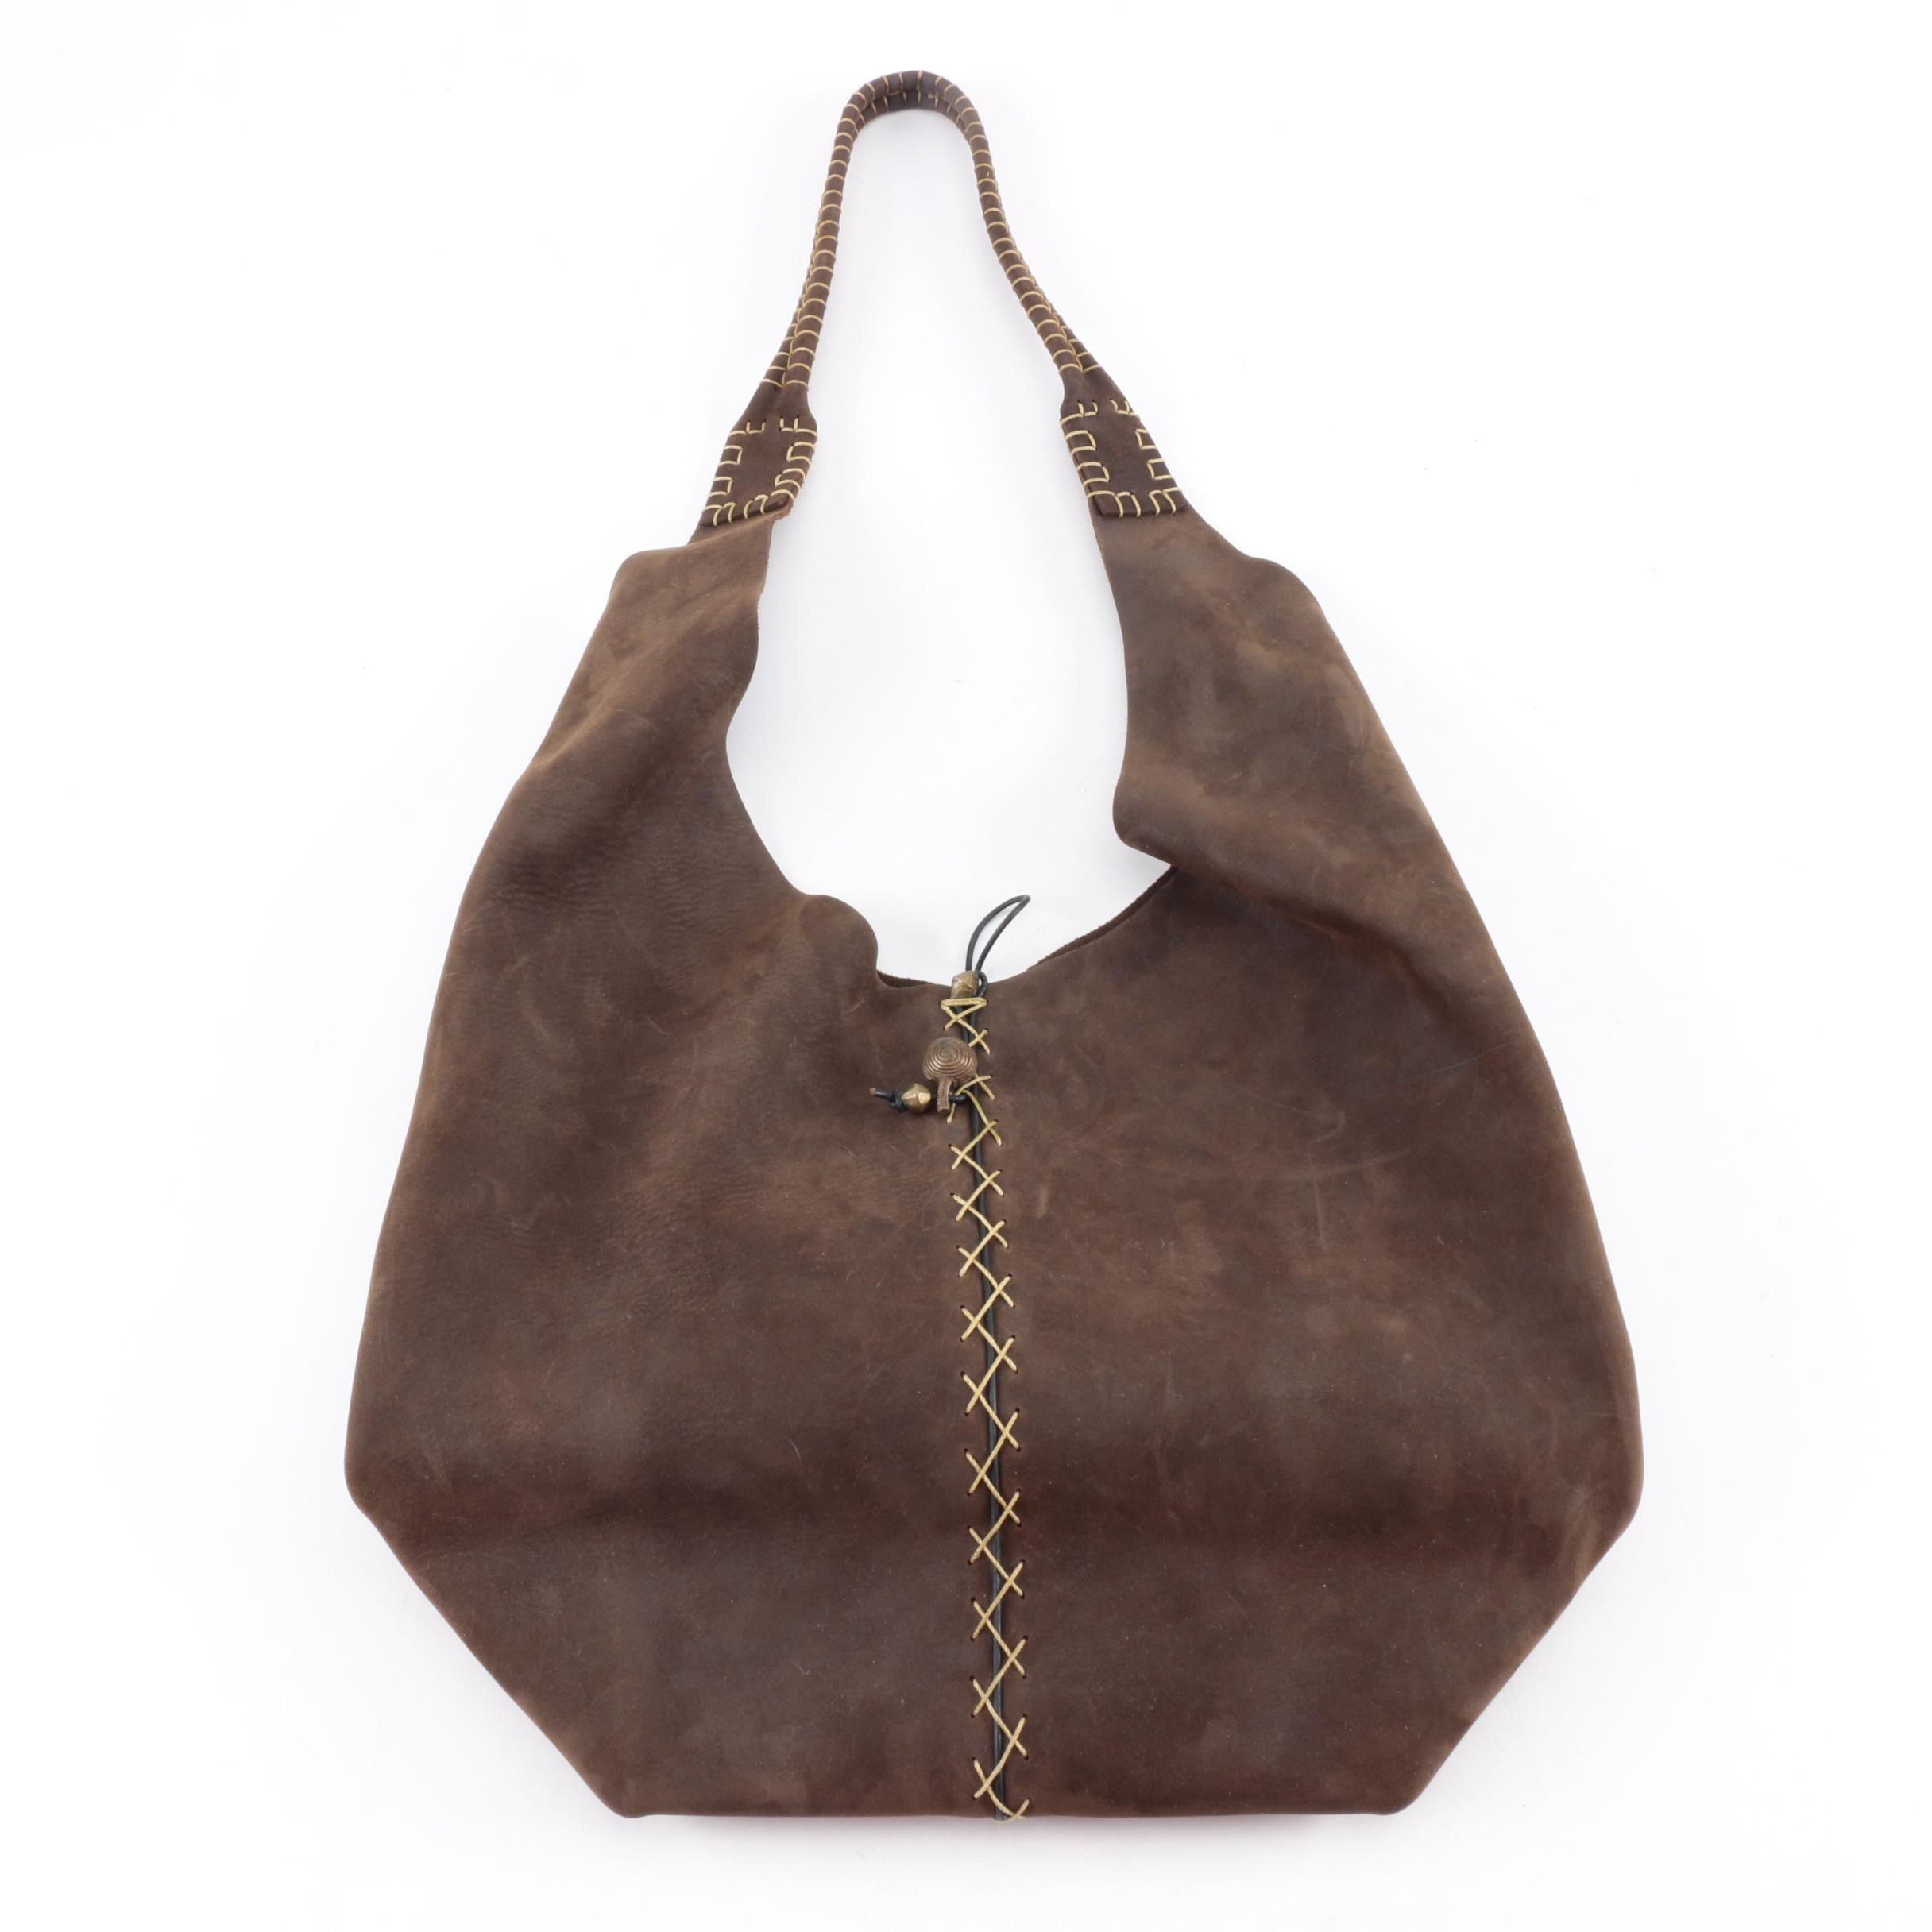 Tauro Santa Barbara Brown Leather Hobo Handbag